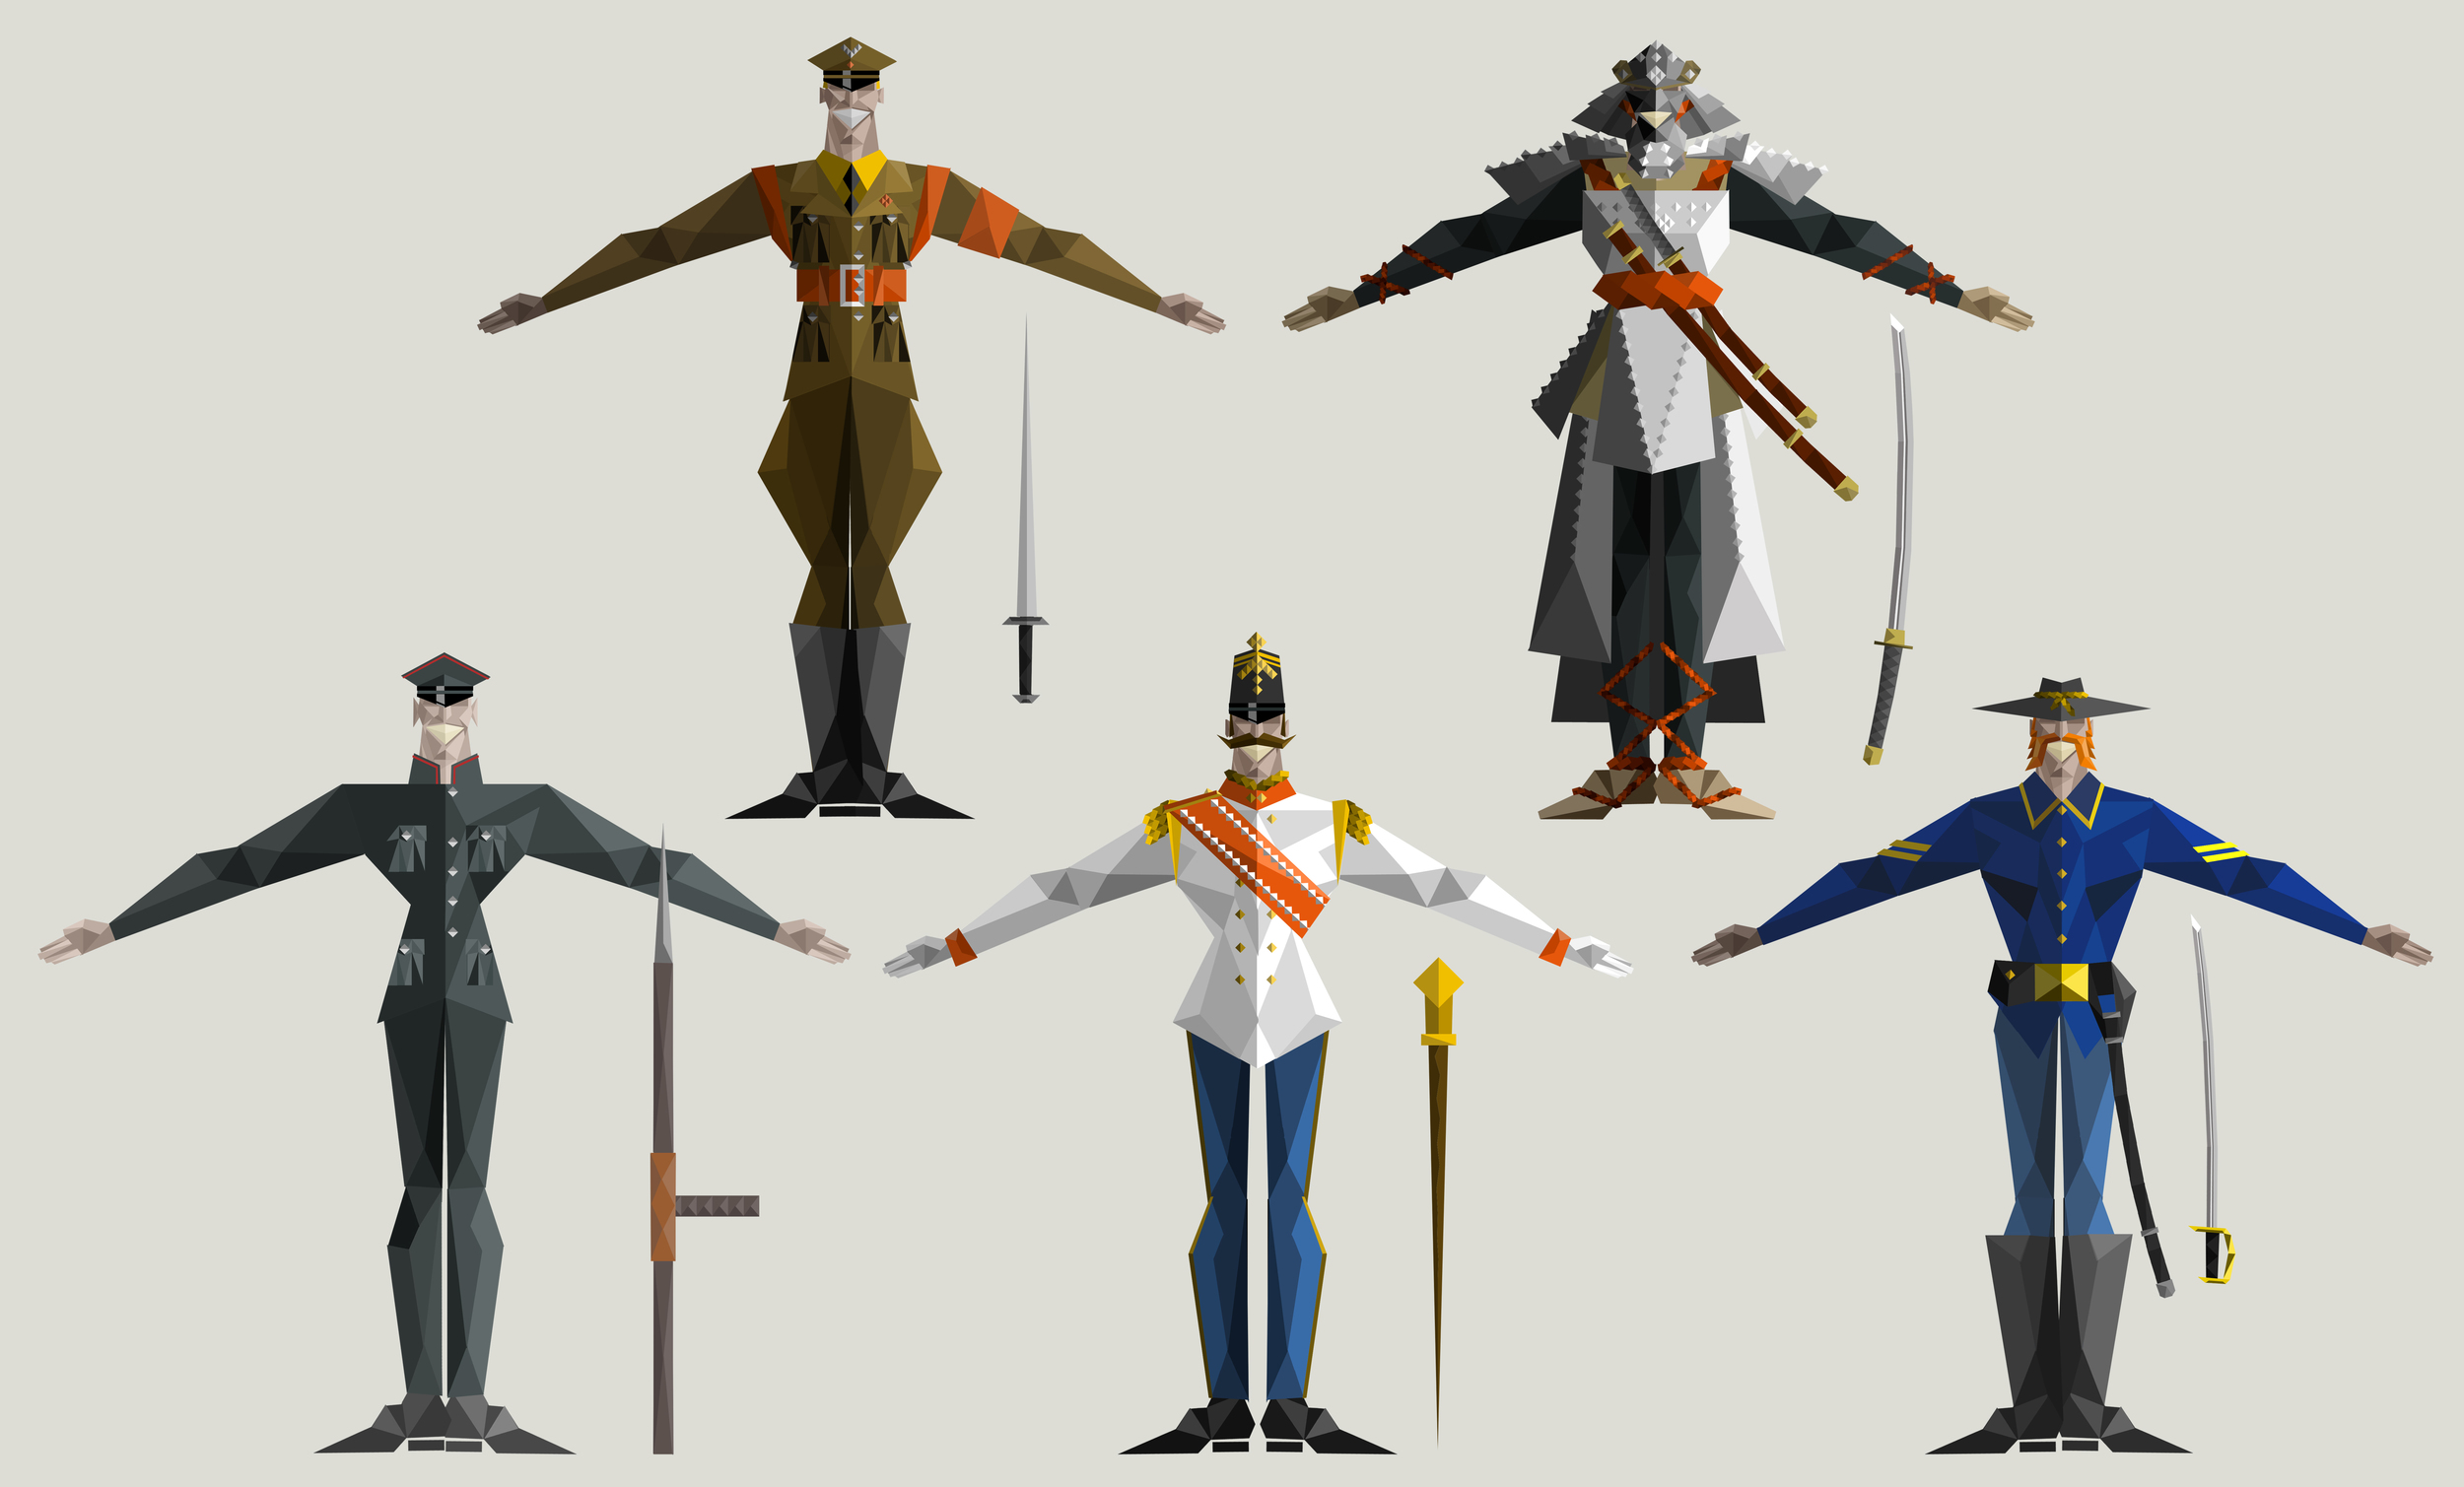 character_design_marionettes.jpg